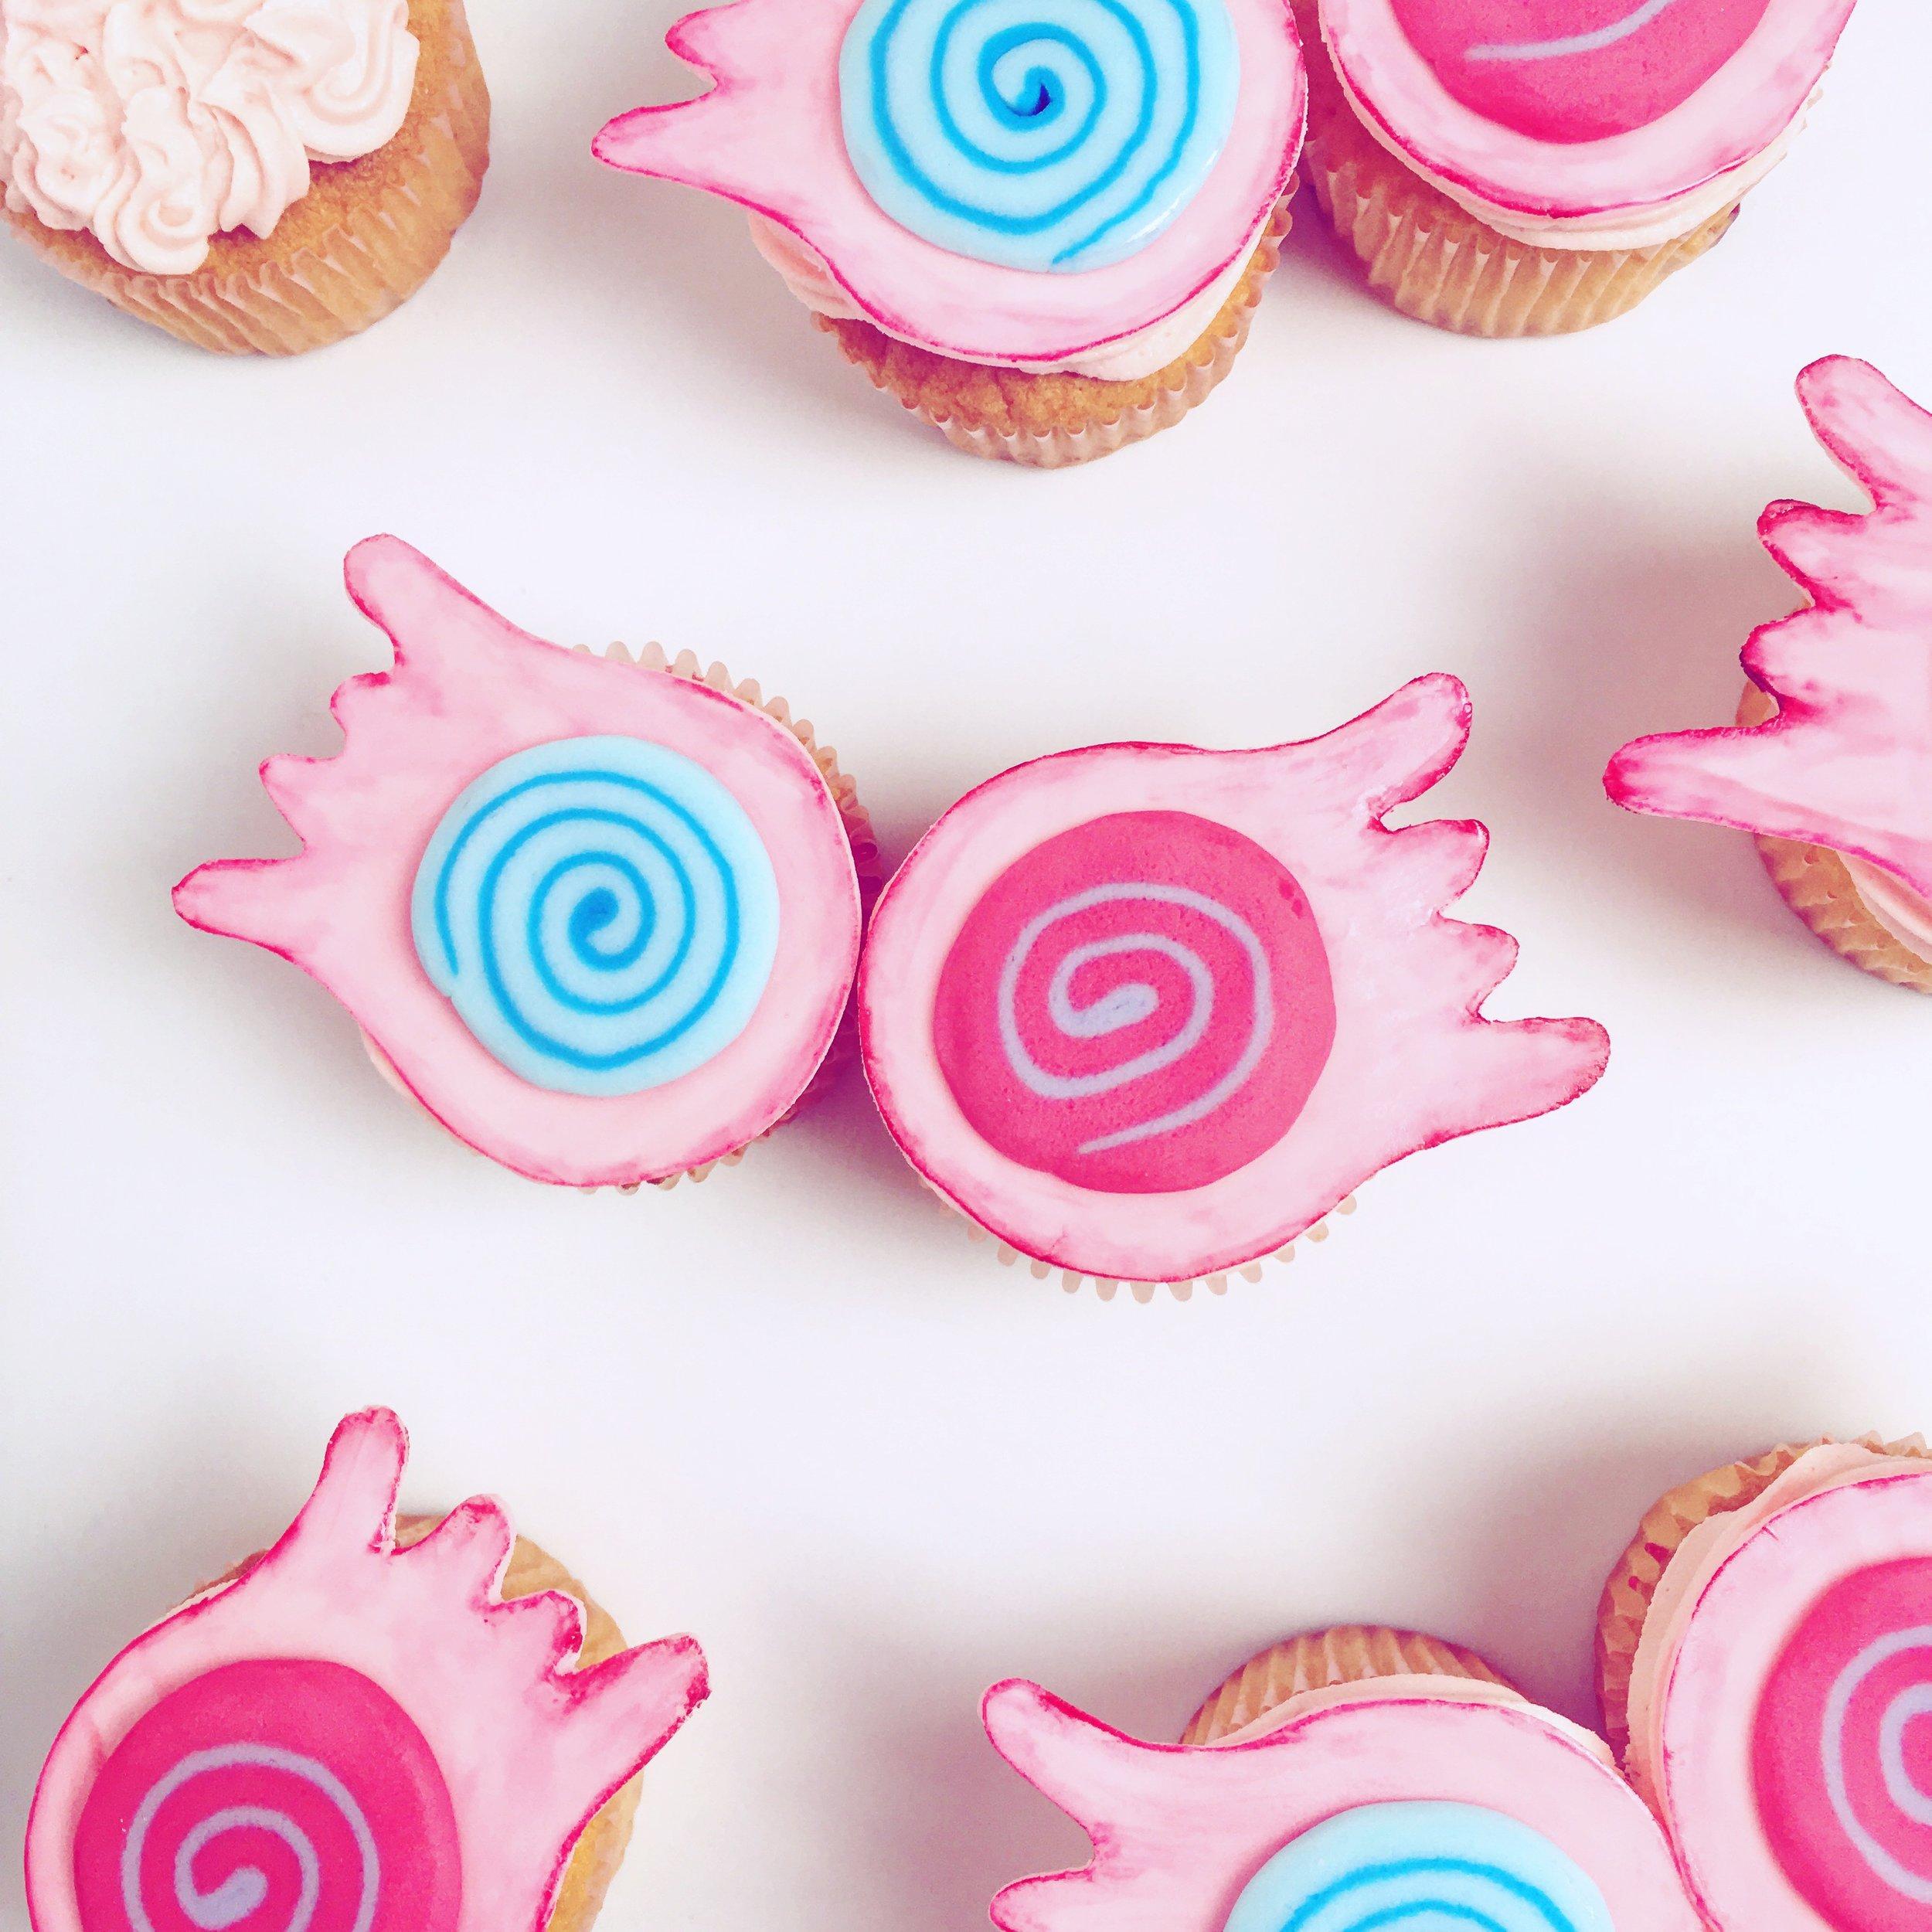 Super Simple Luna Lovegood Cupcakes (DIY Spectrespecs)